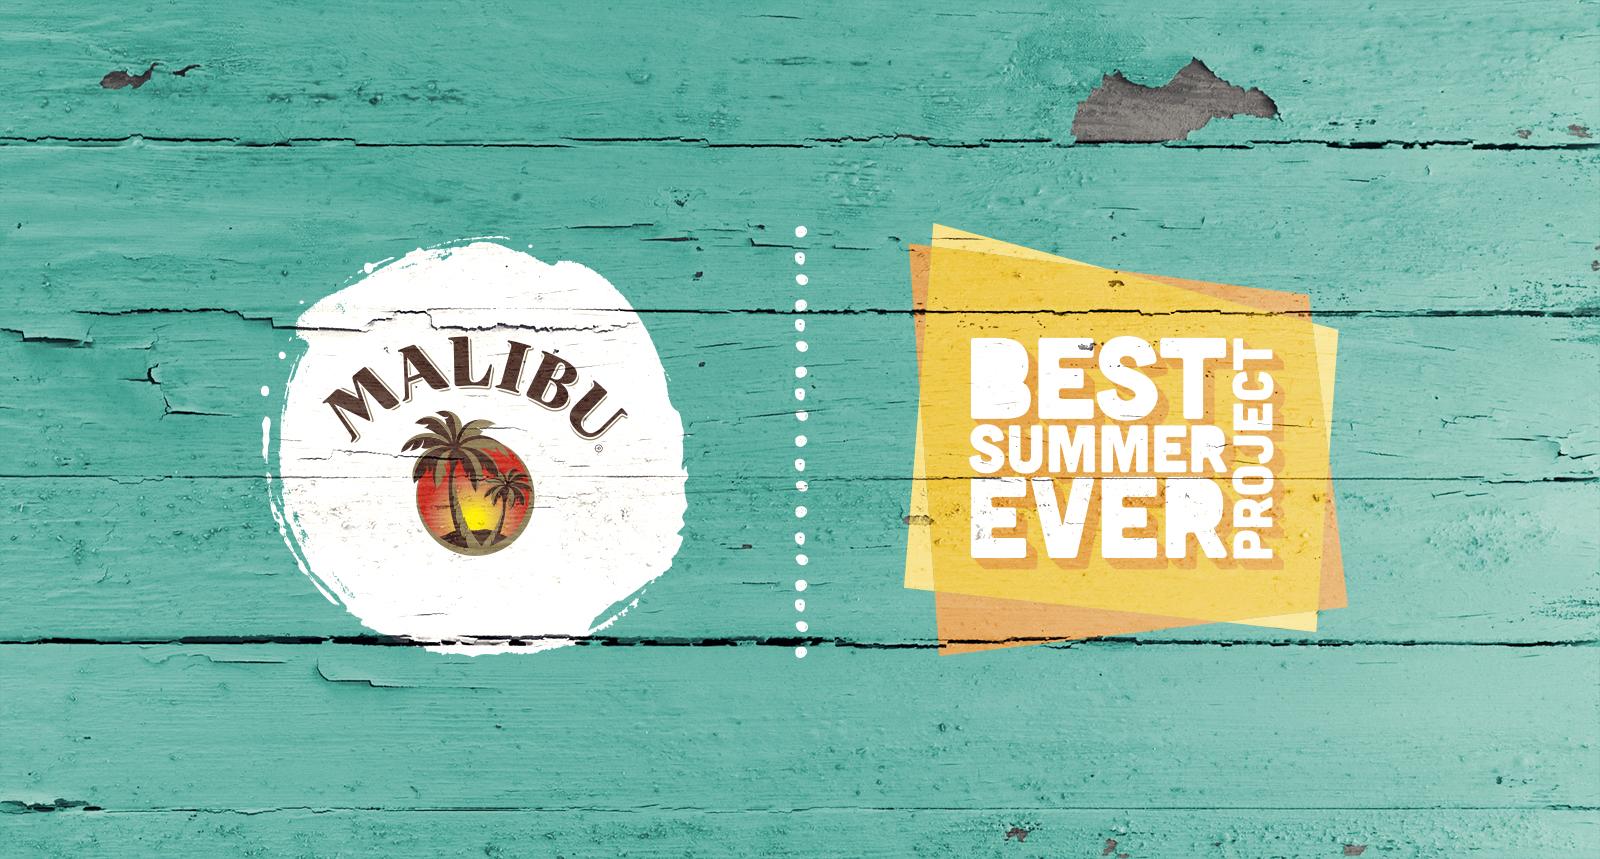 Malibu Best Summer Ever Project.jpg